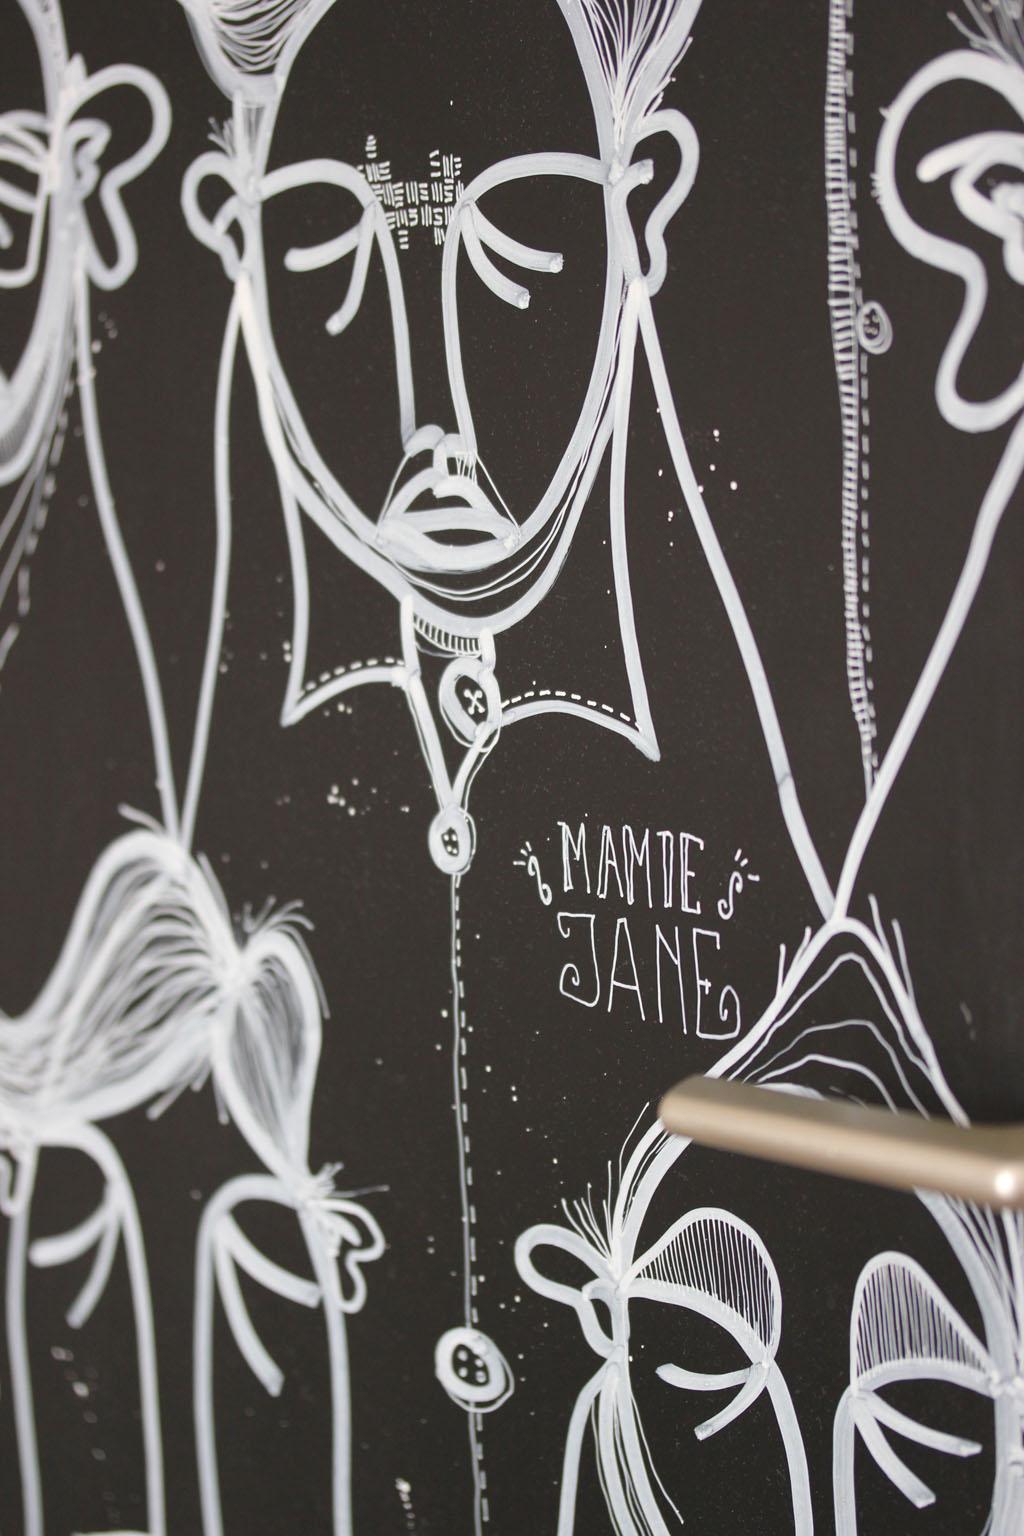 Mamie_Jane-Aix_Les_Bains-Hotel-Restaurant-Bar-Arty-Tomas-Porte-Chambre_10